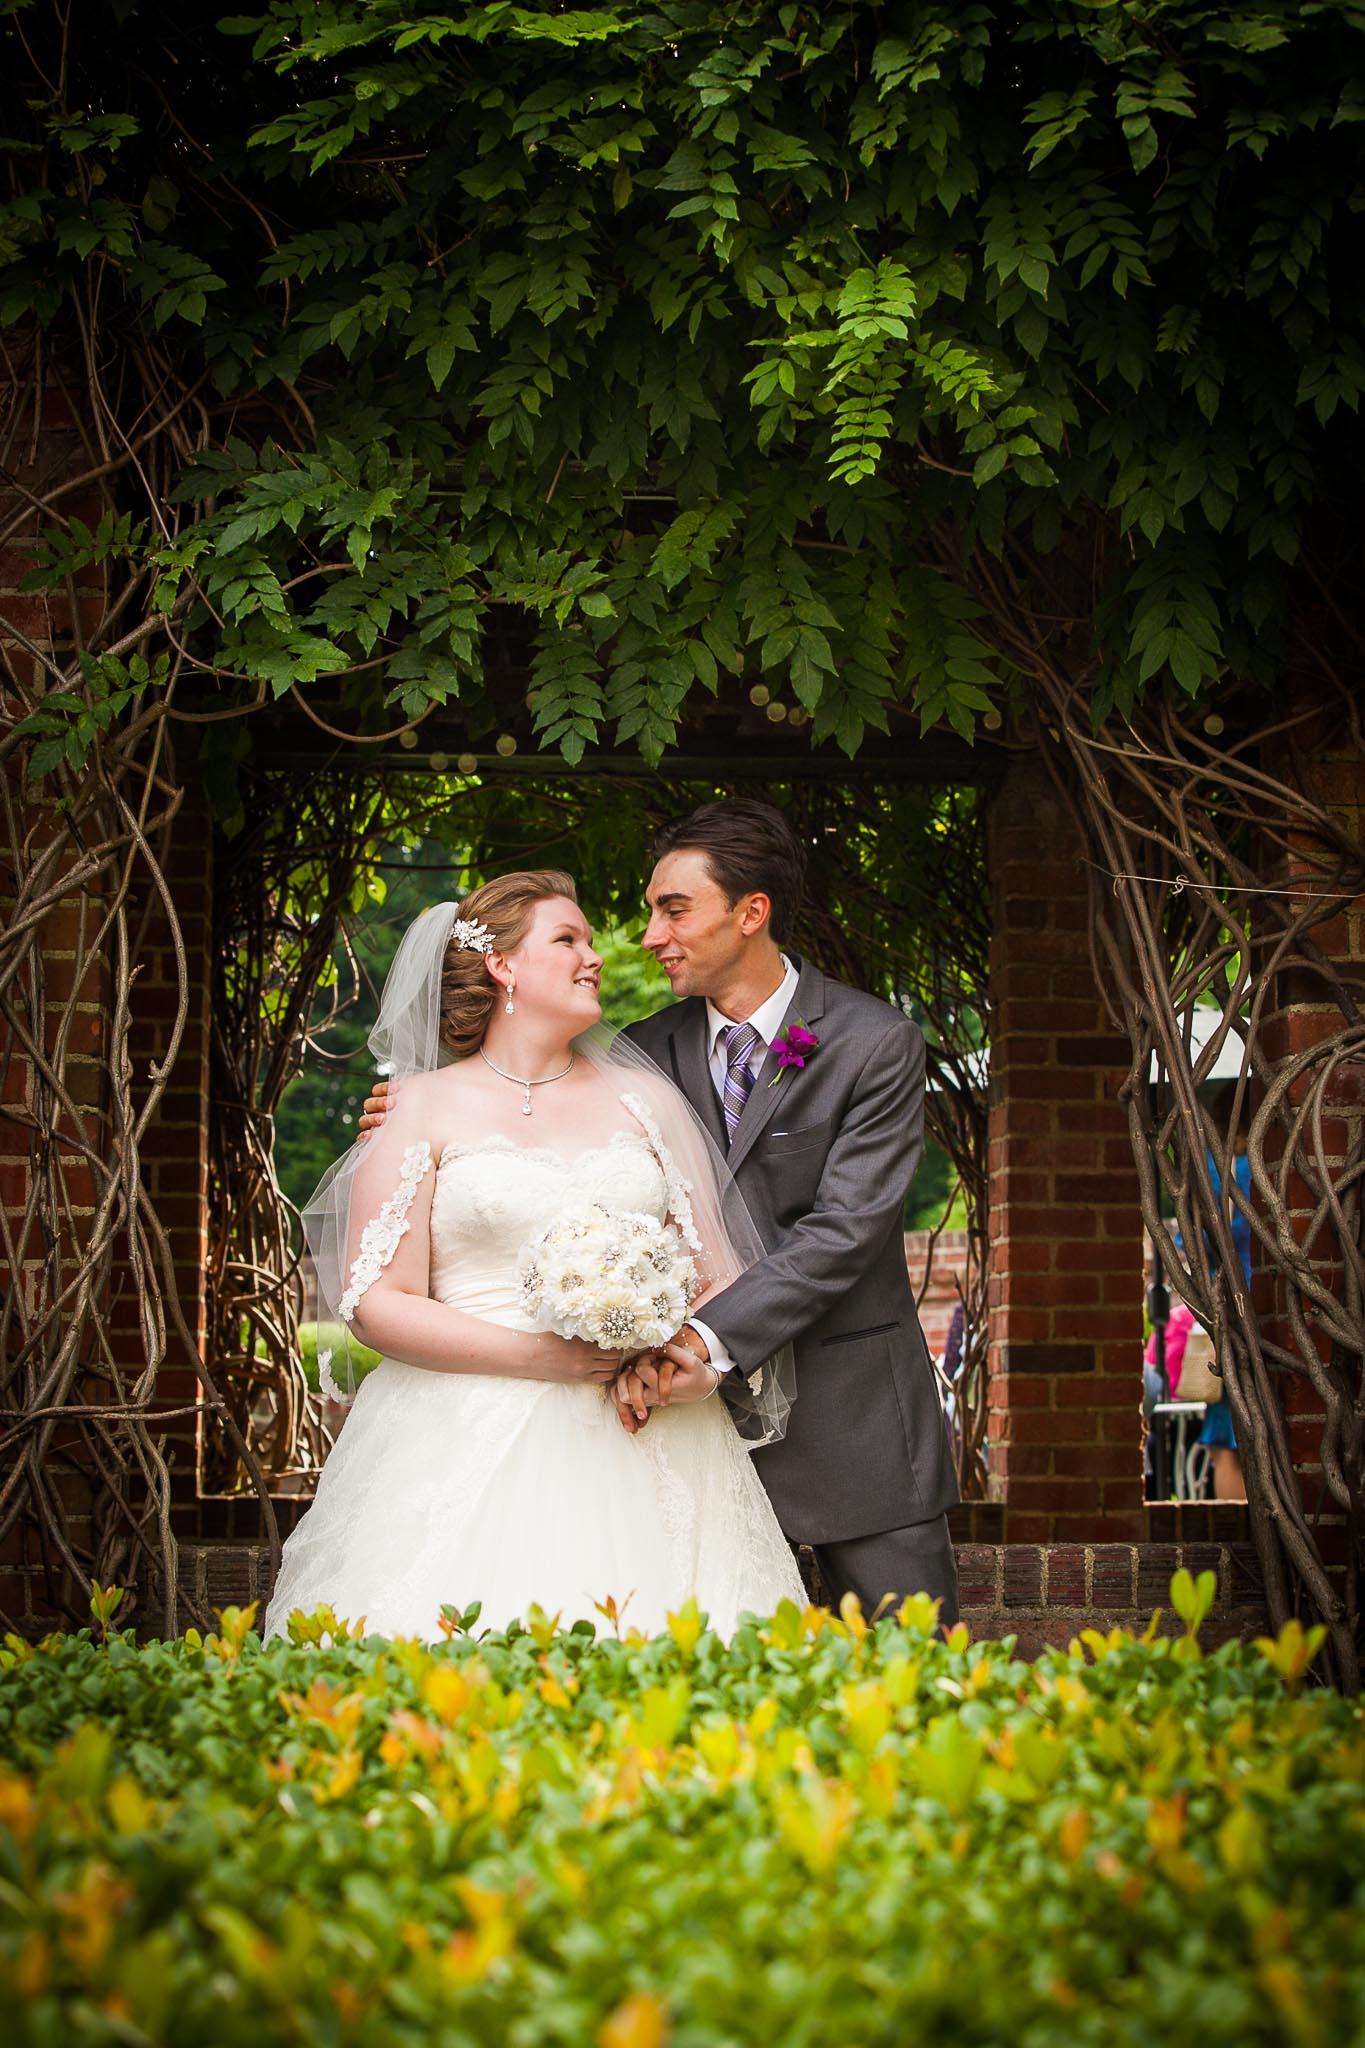 mankin mansion wedding, virginia wedding photographer, virginia gay wedding photographer, virginia indian wedding photographer